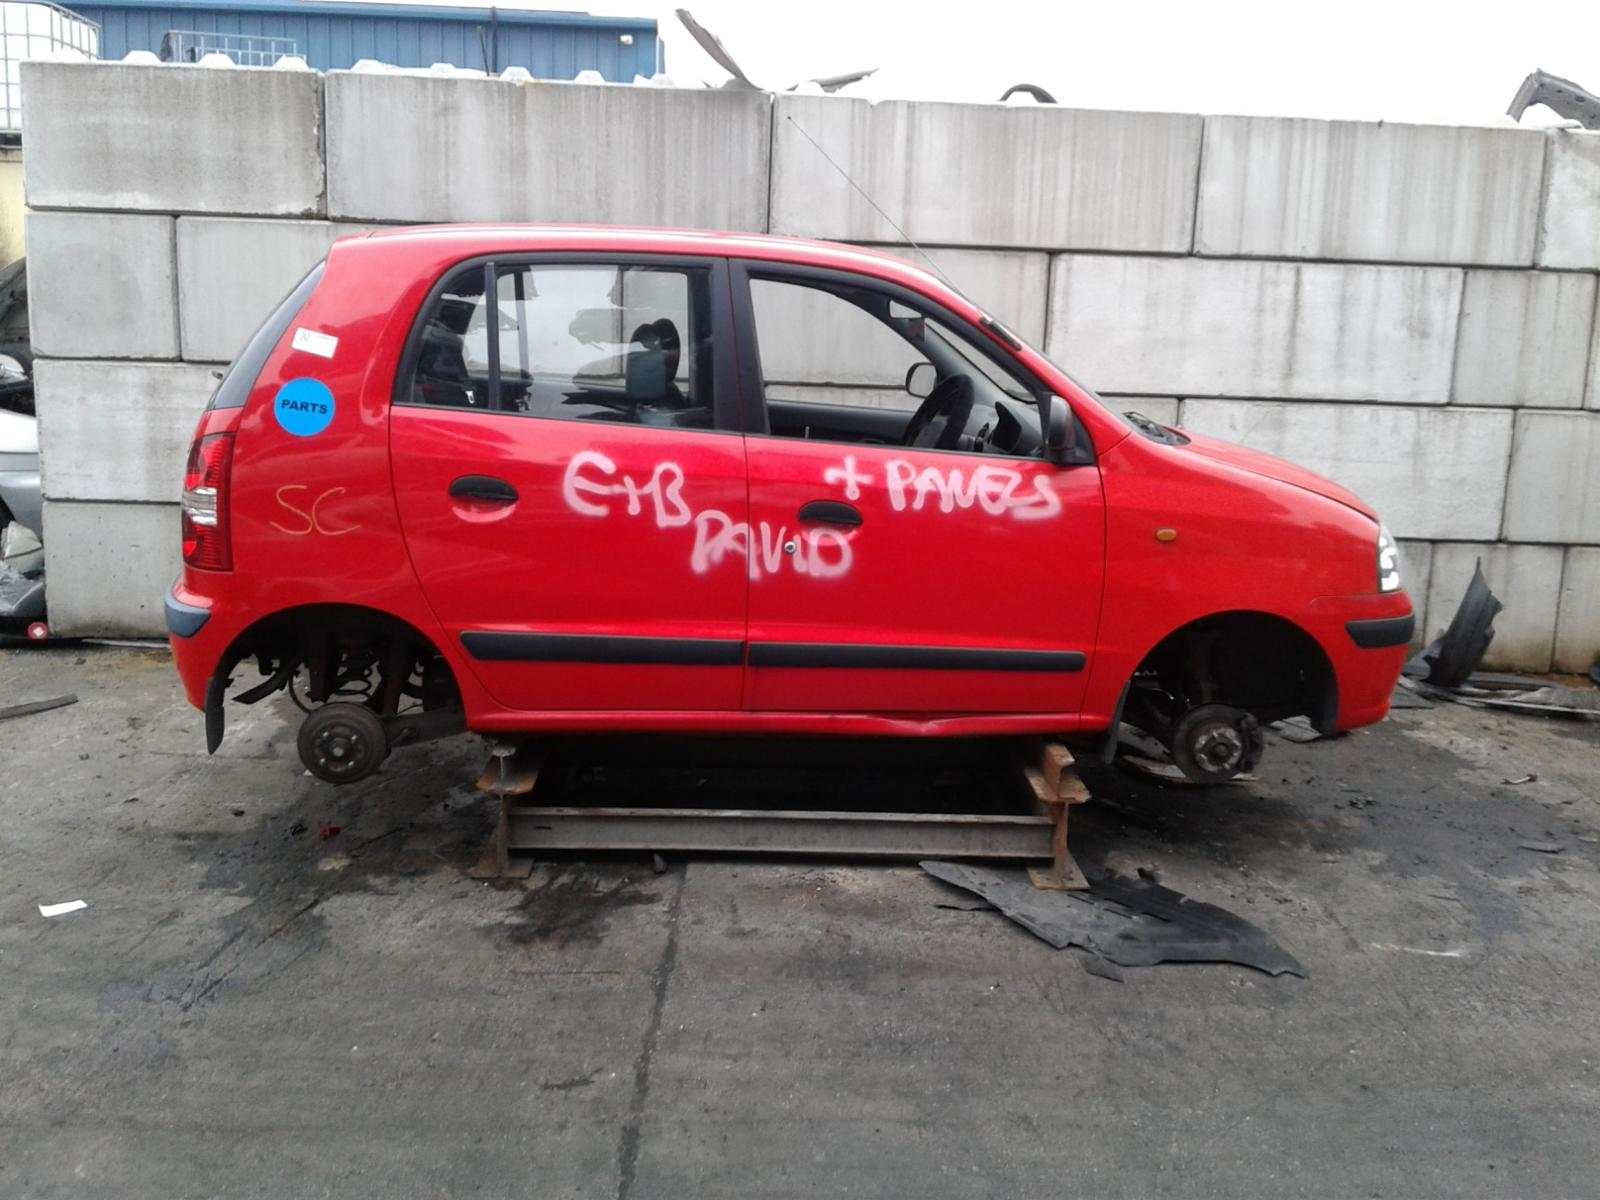 Image for a HYUNDAI AMICA 2007 5 Door Hatchback